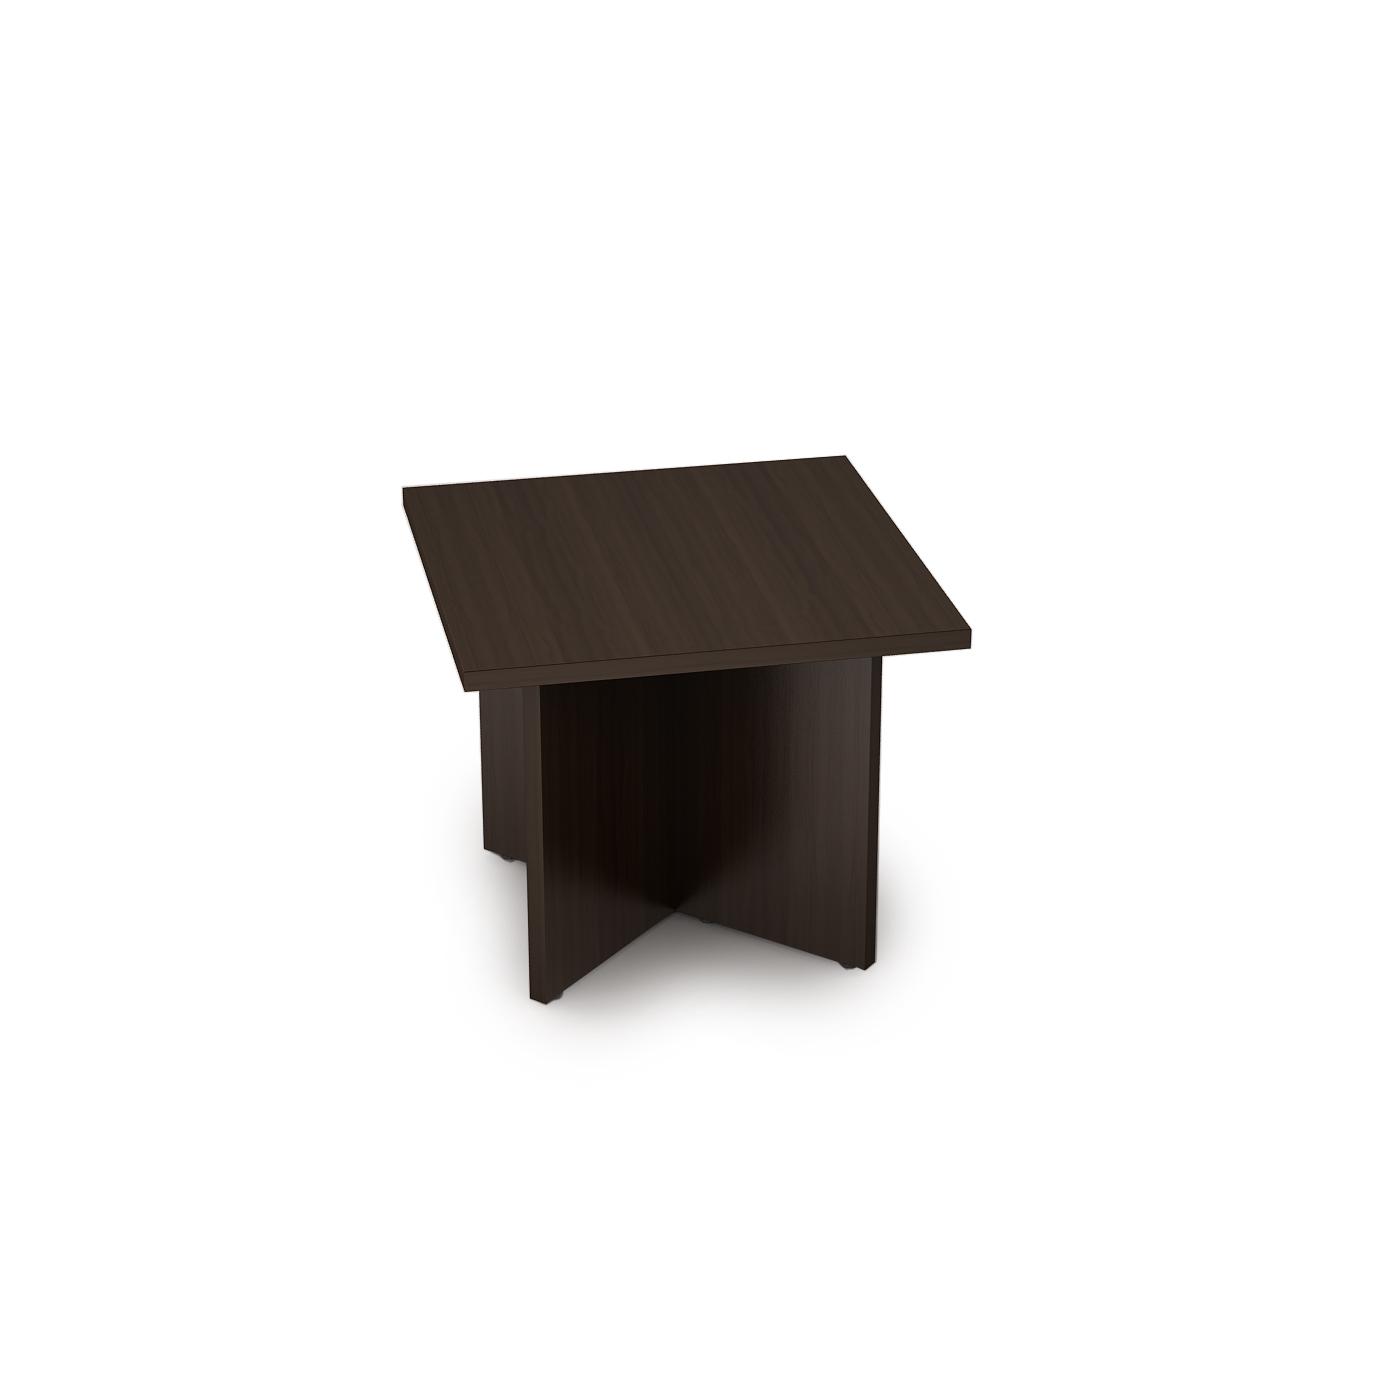 4СП.009 Стол для переговоров (900*900*750)